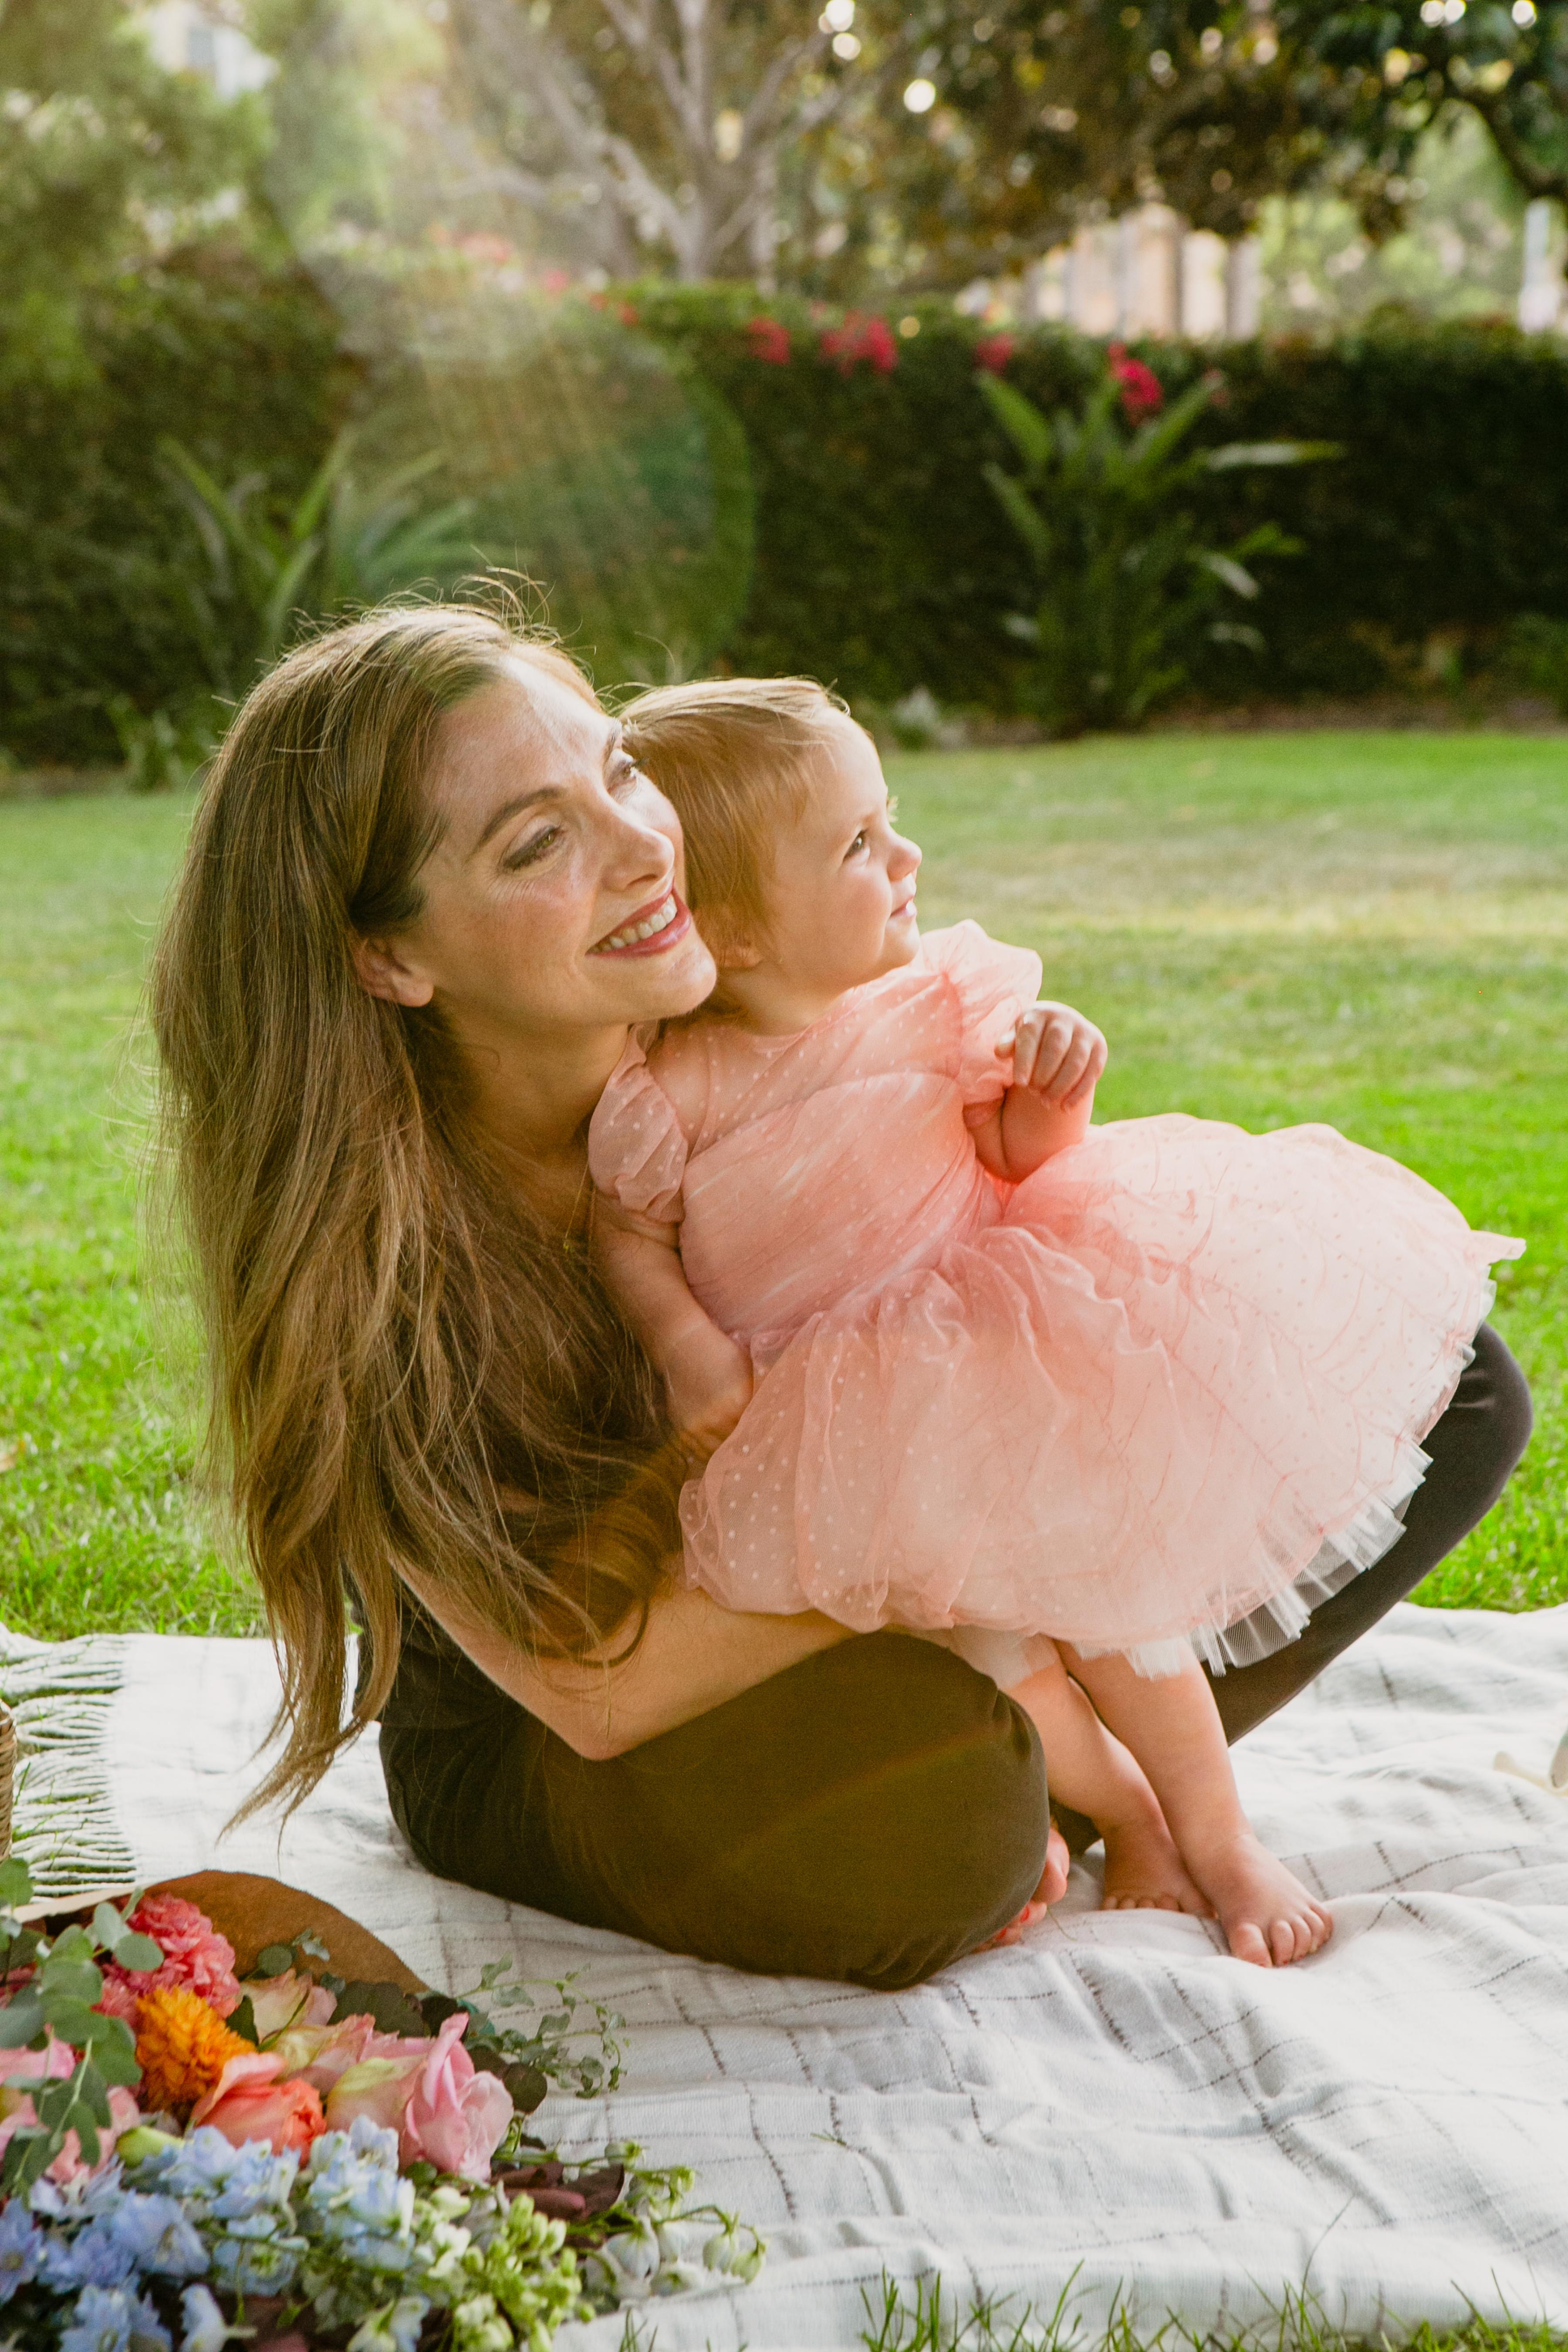 pink dress birthday picnic hugs